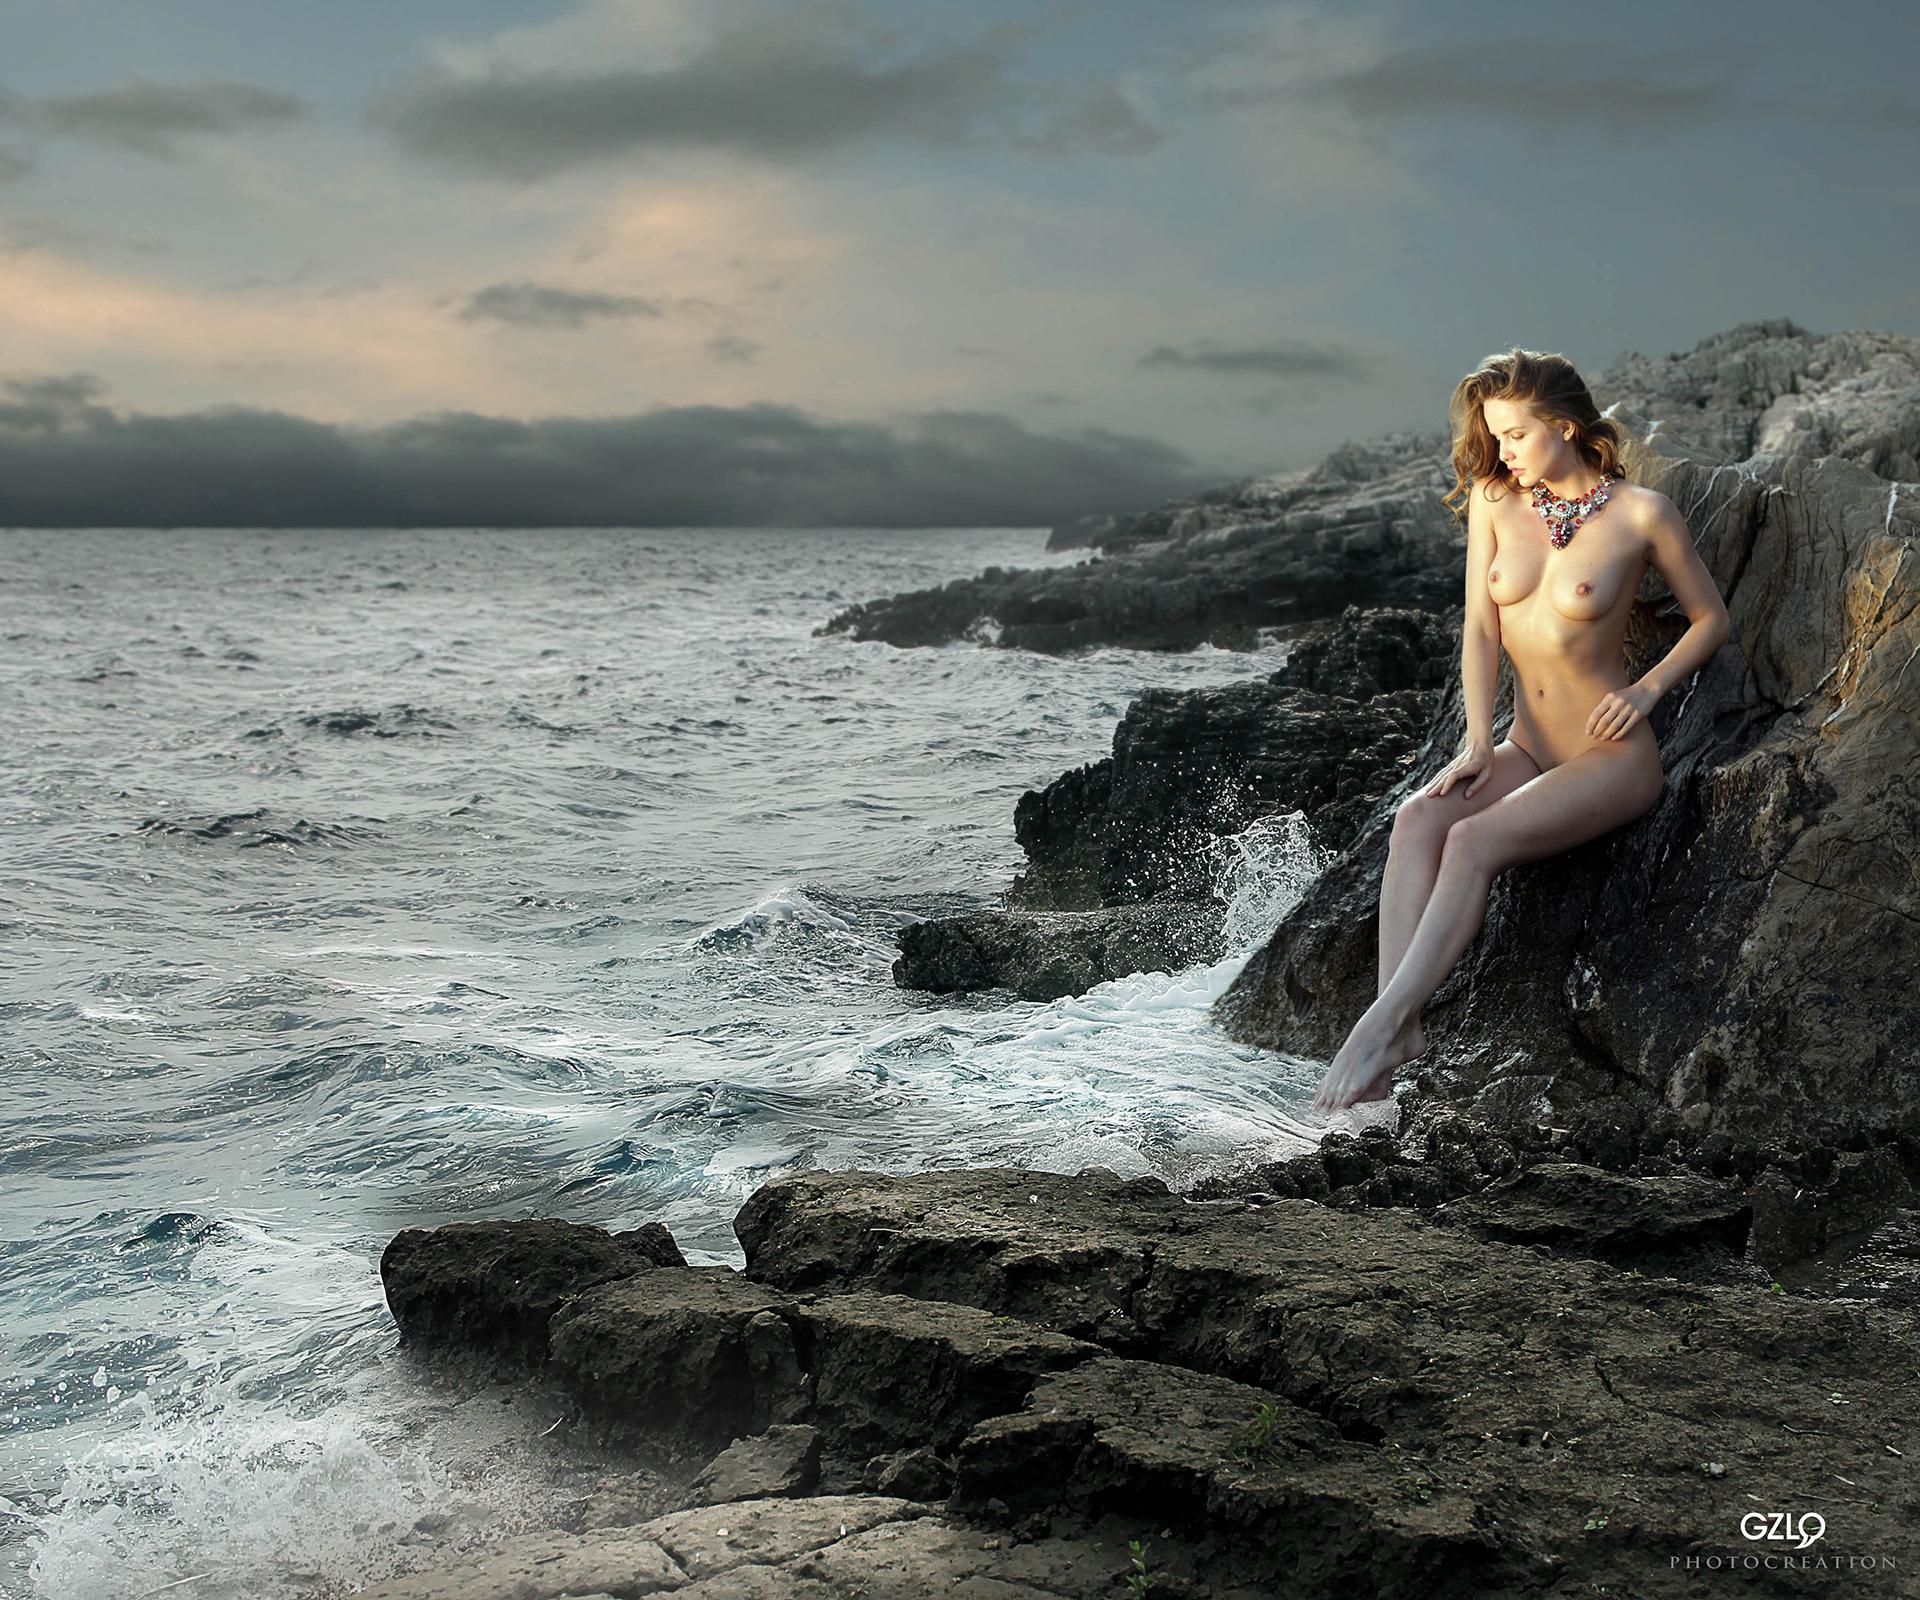 Photocreation: Gonzalo Villar – Model: Kristina Yakimova – Photo ...: https://gzlo.wordpress.com/kristina-yakimova/on-the-rocks-new-by-gzlo